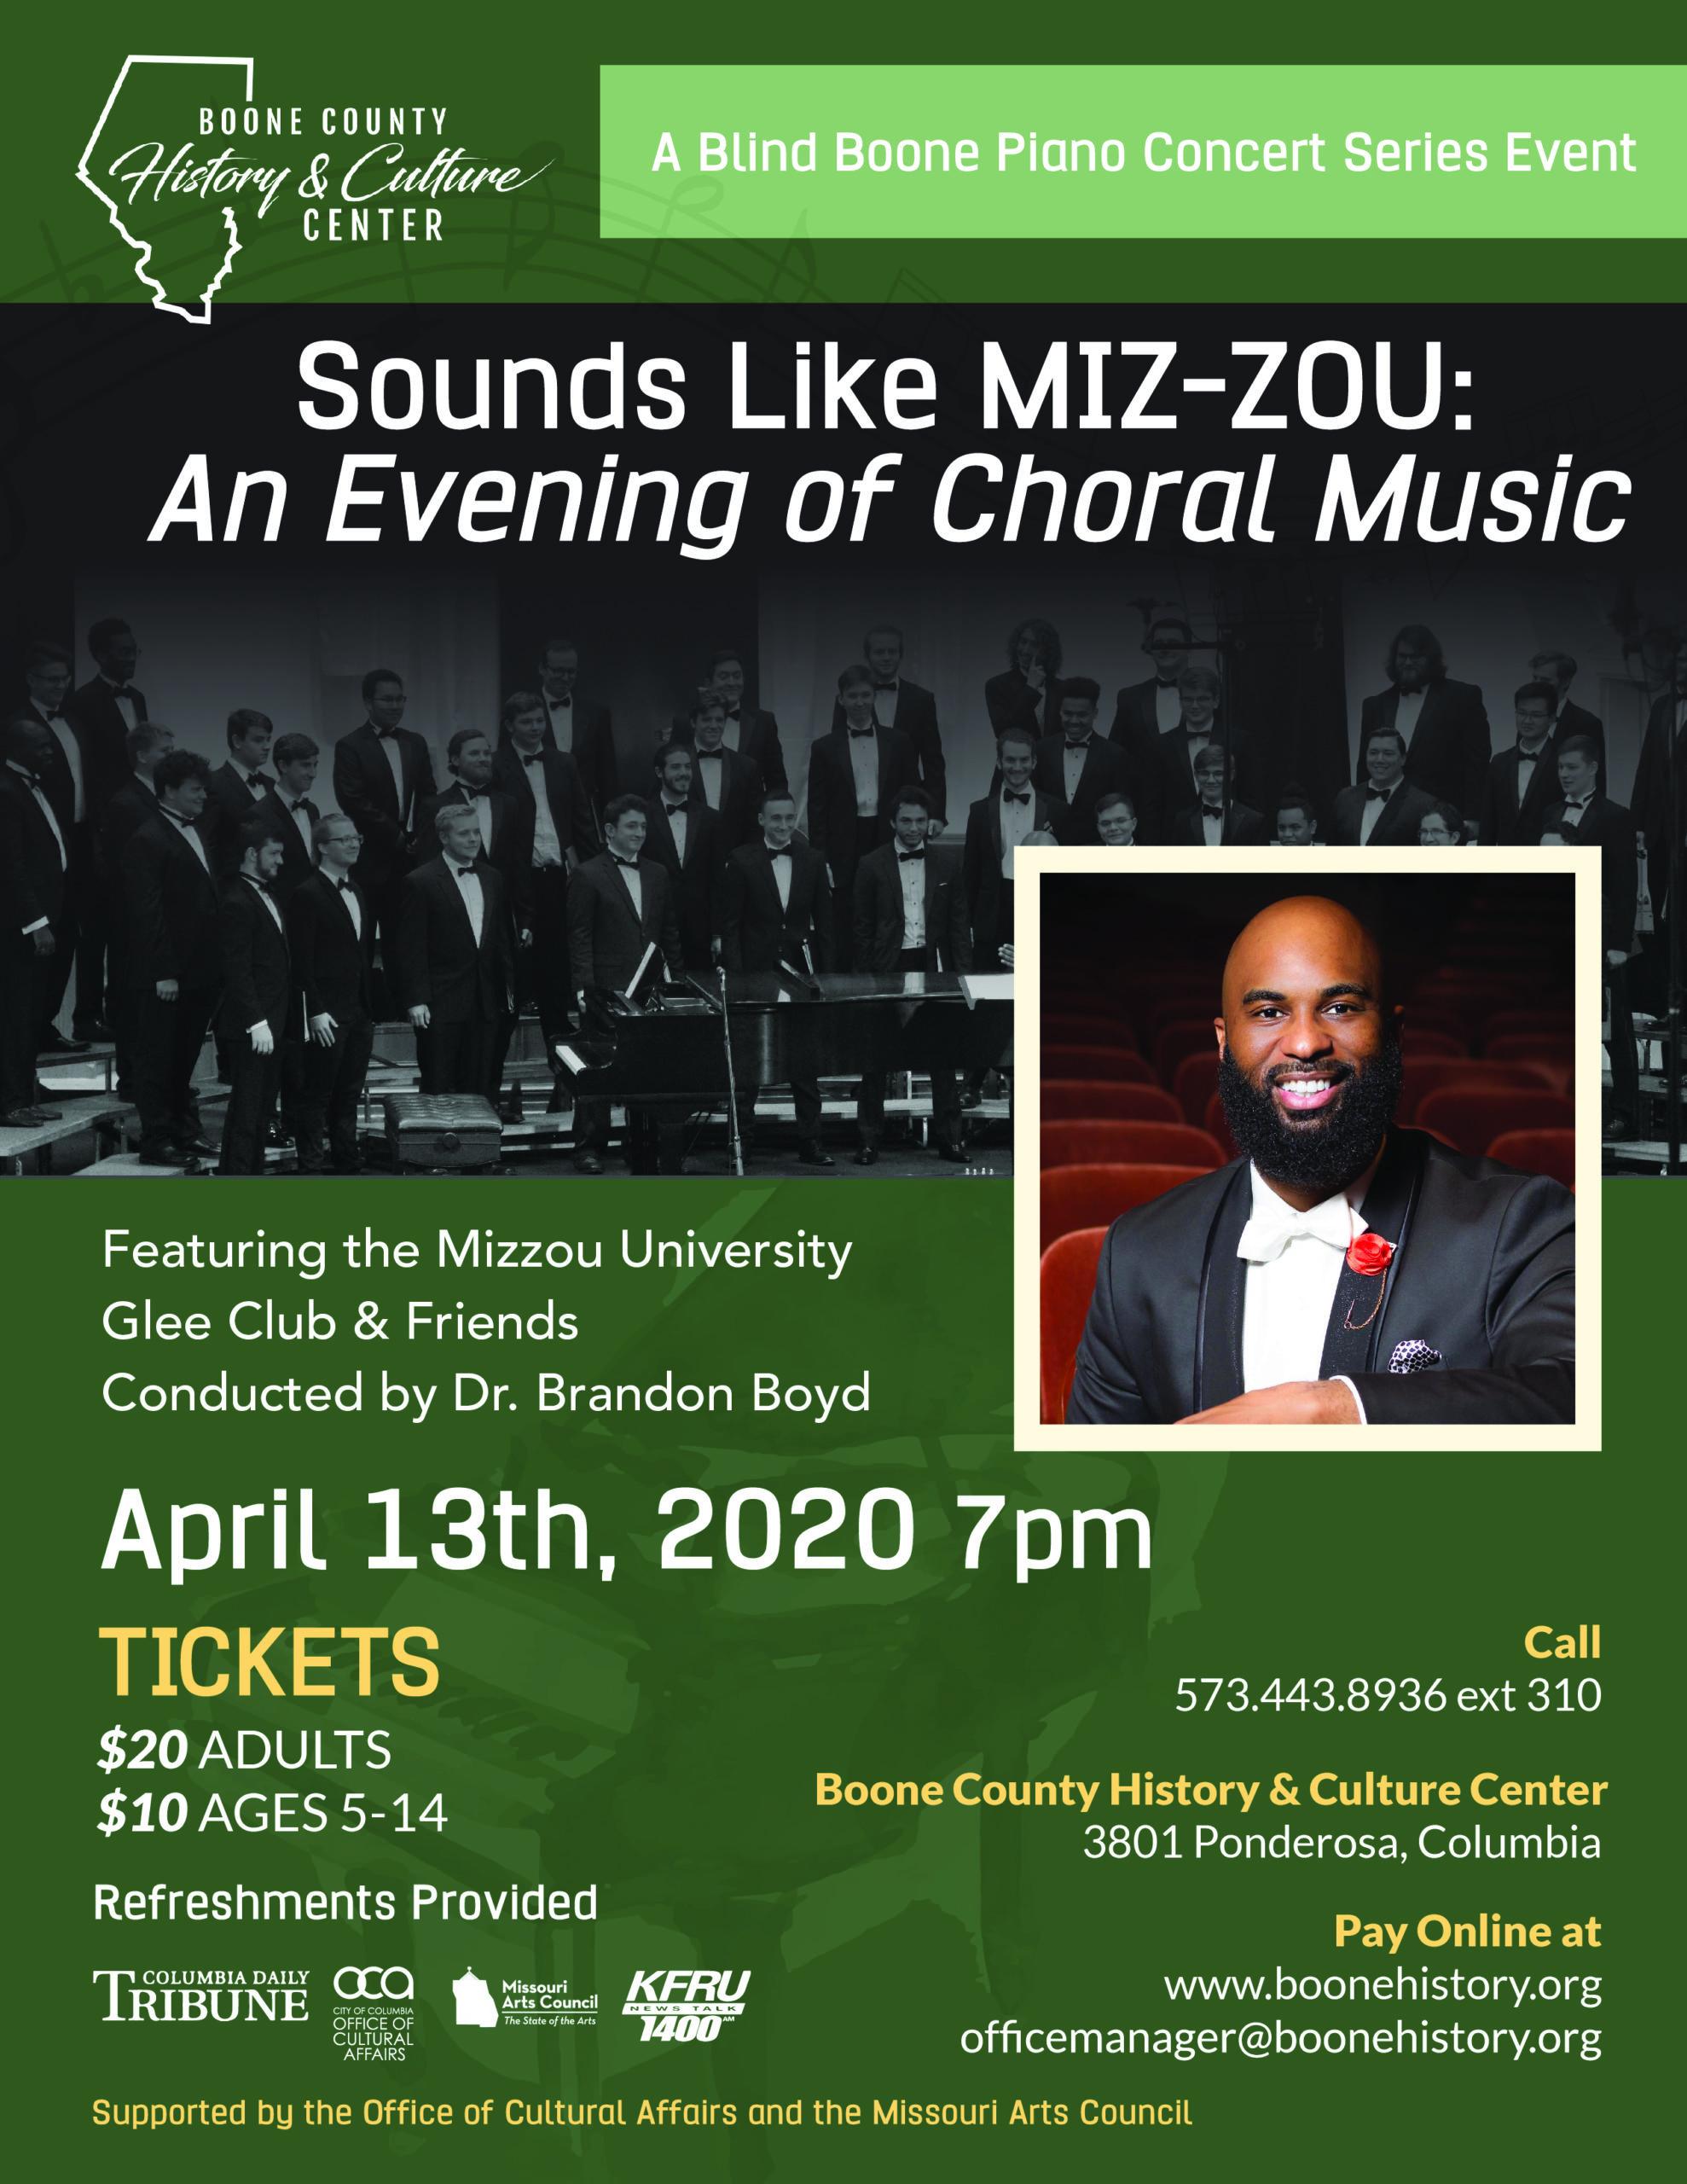 POSTPONED: Sounds Like MIZ-ZOU: An Evening of Choral Music